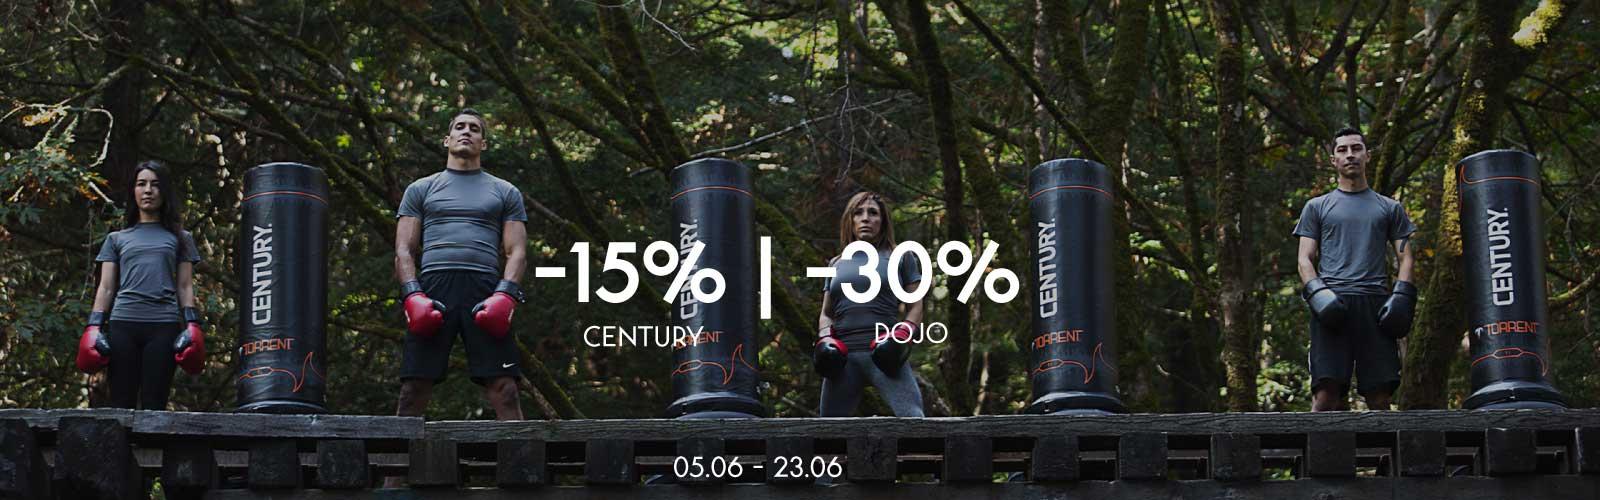 -15% to-30%